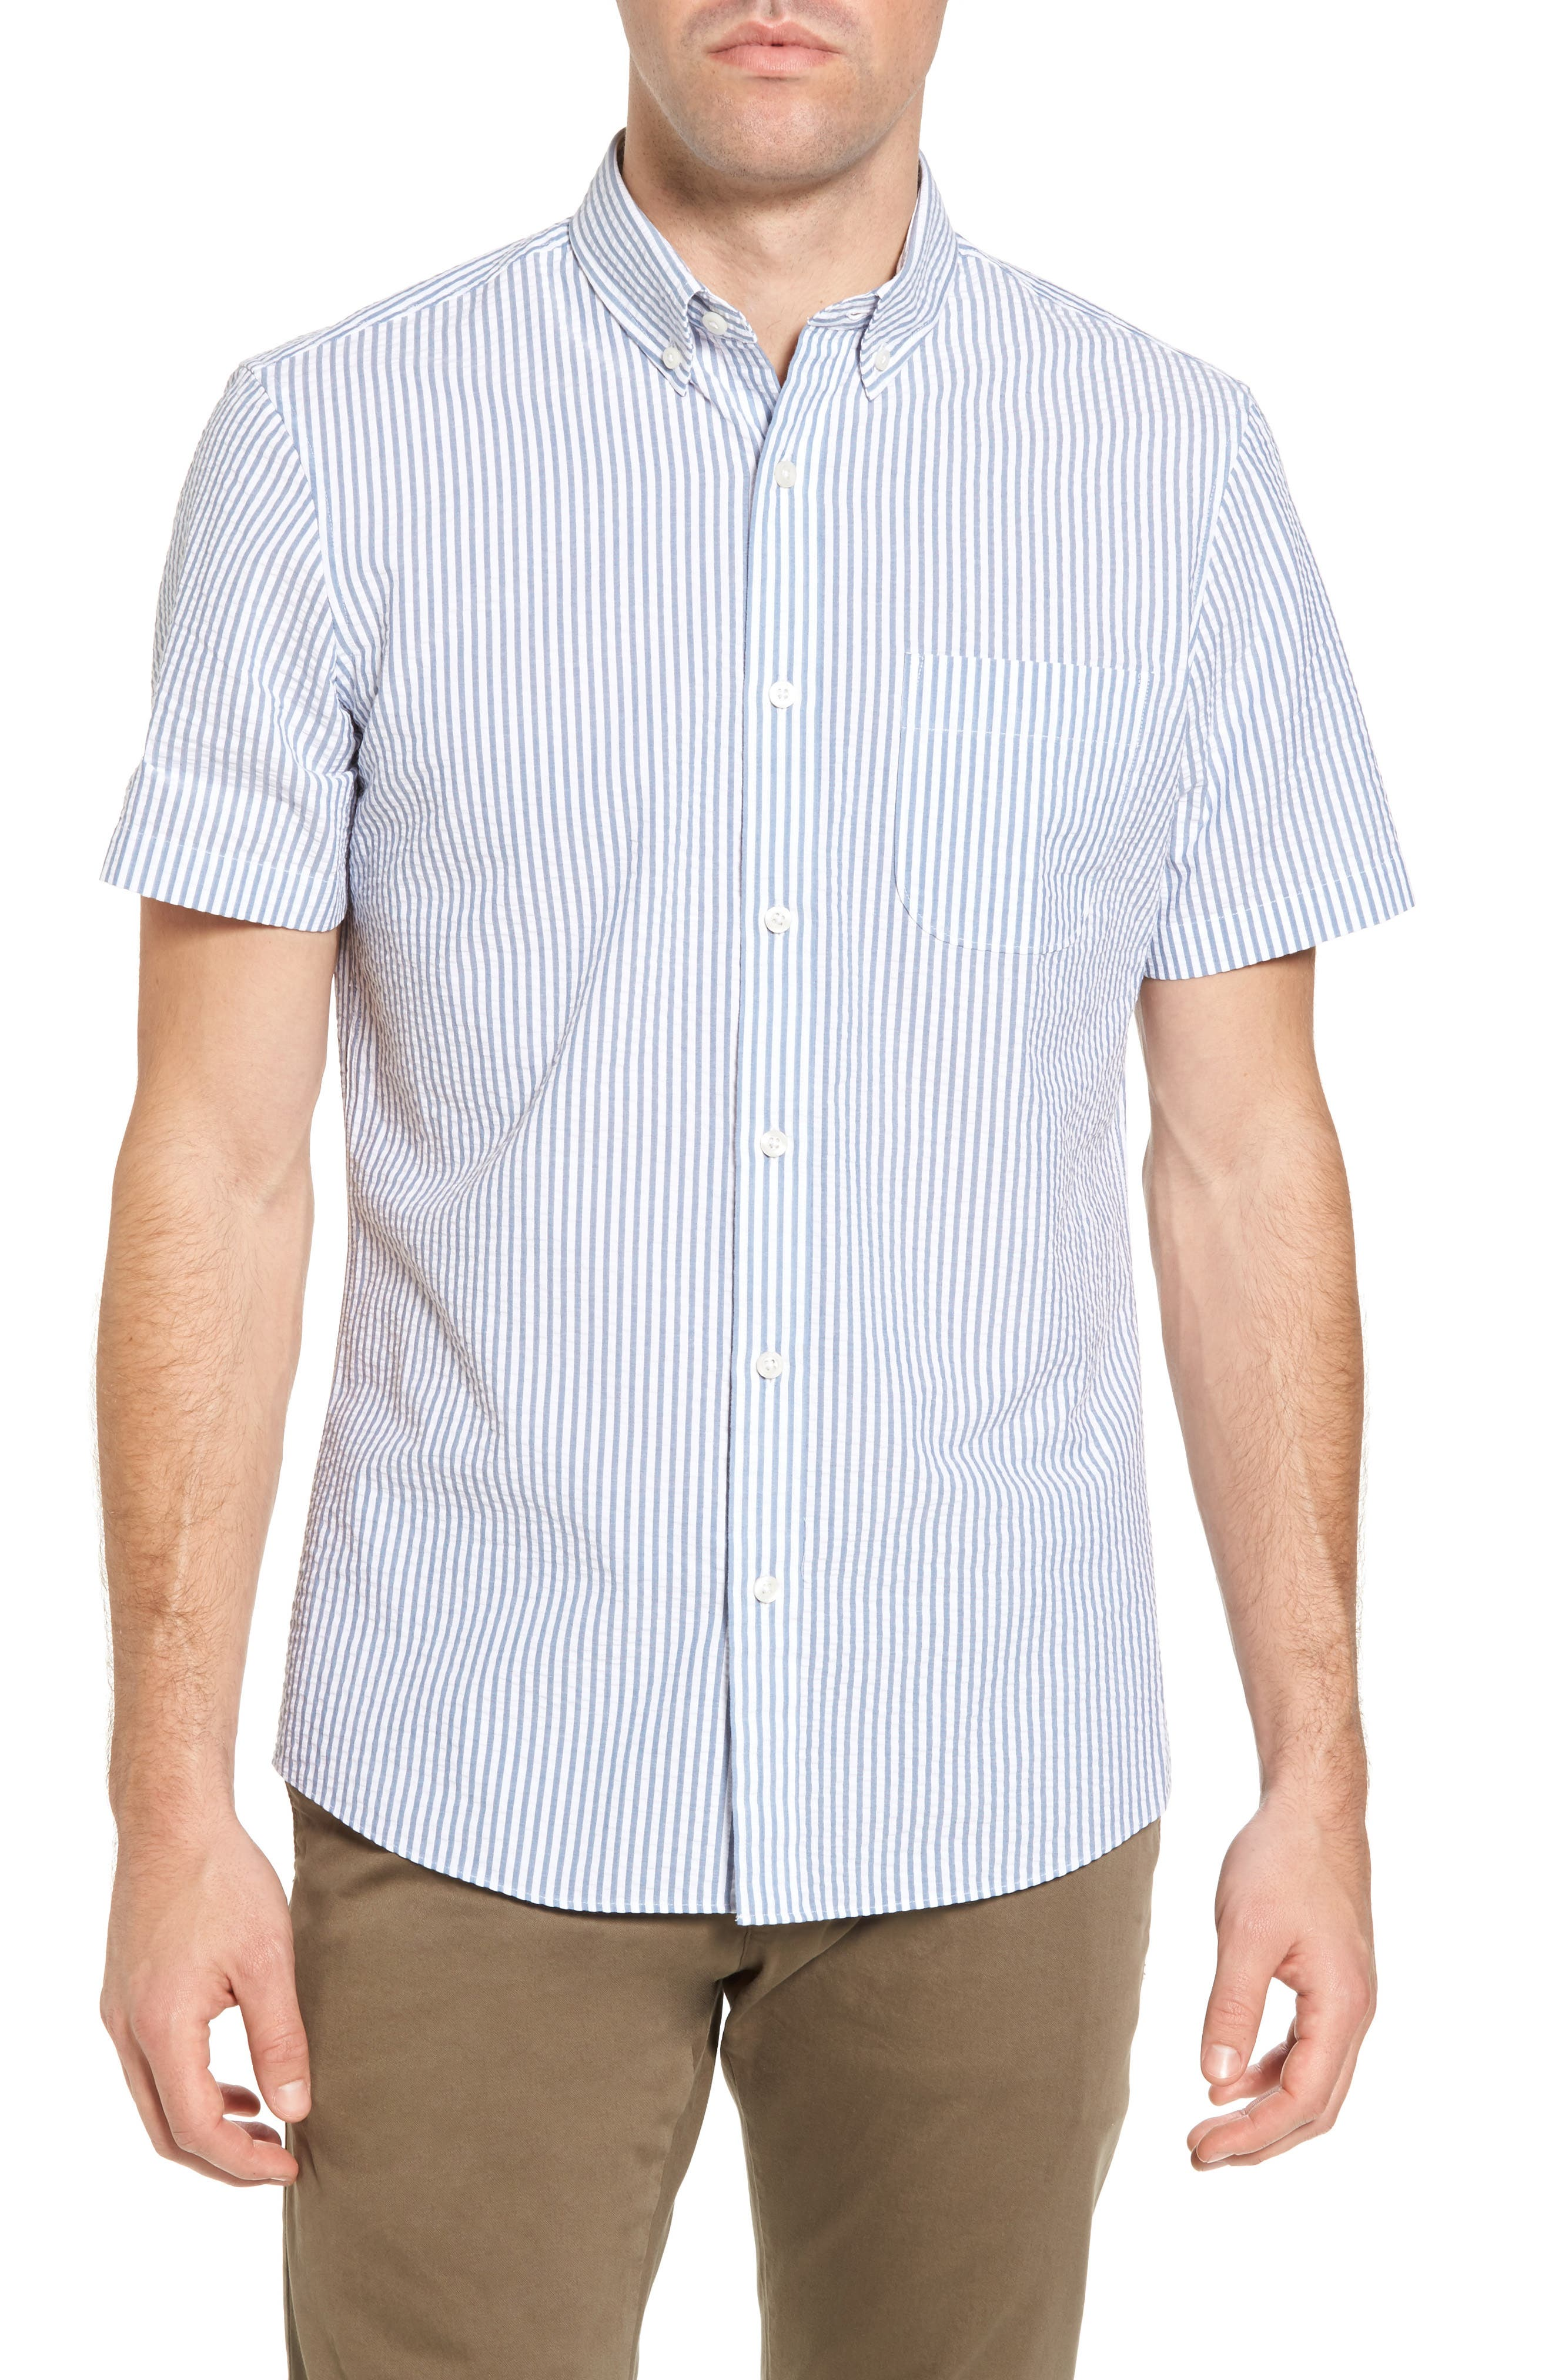 Trim Fit Seersucker Short Sleeve Sport Shirt,                         Main,                         color, White Navy Seersucker Stripe